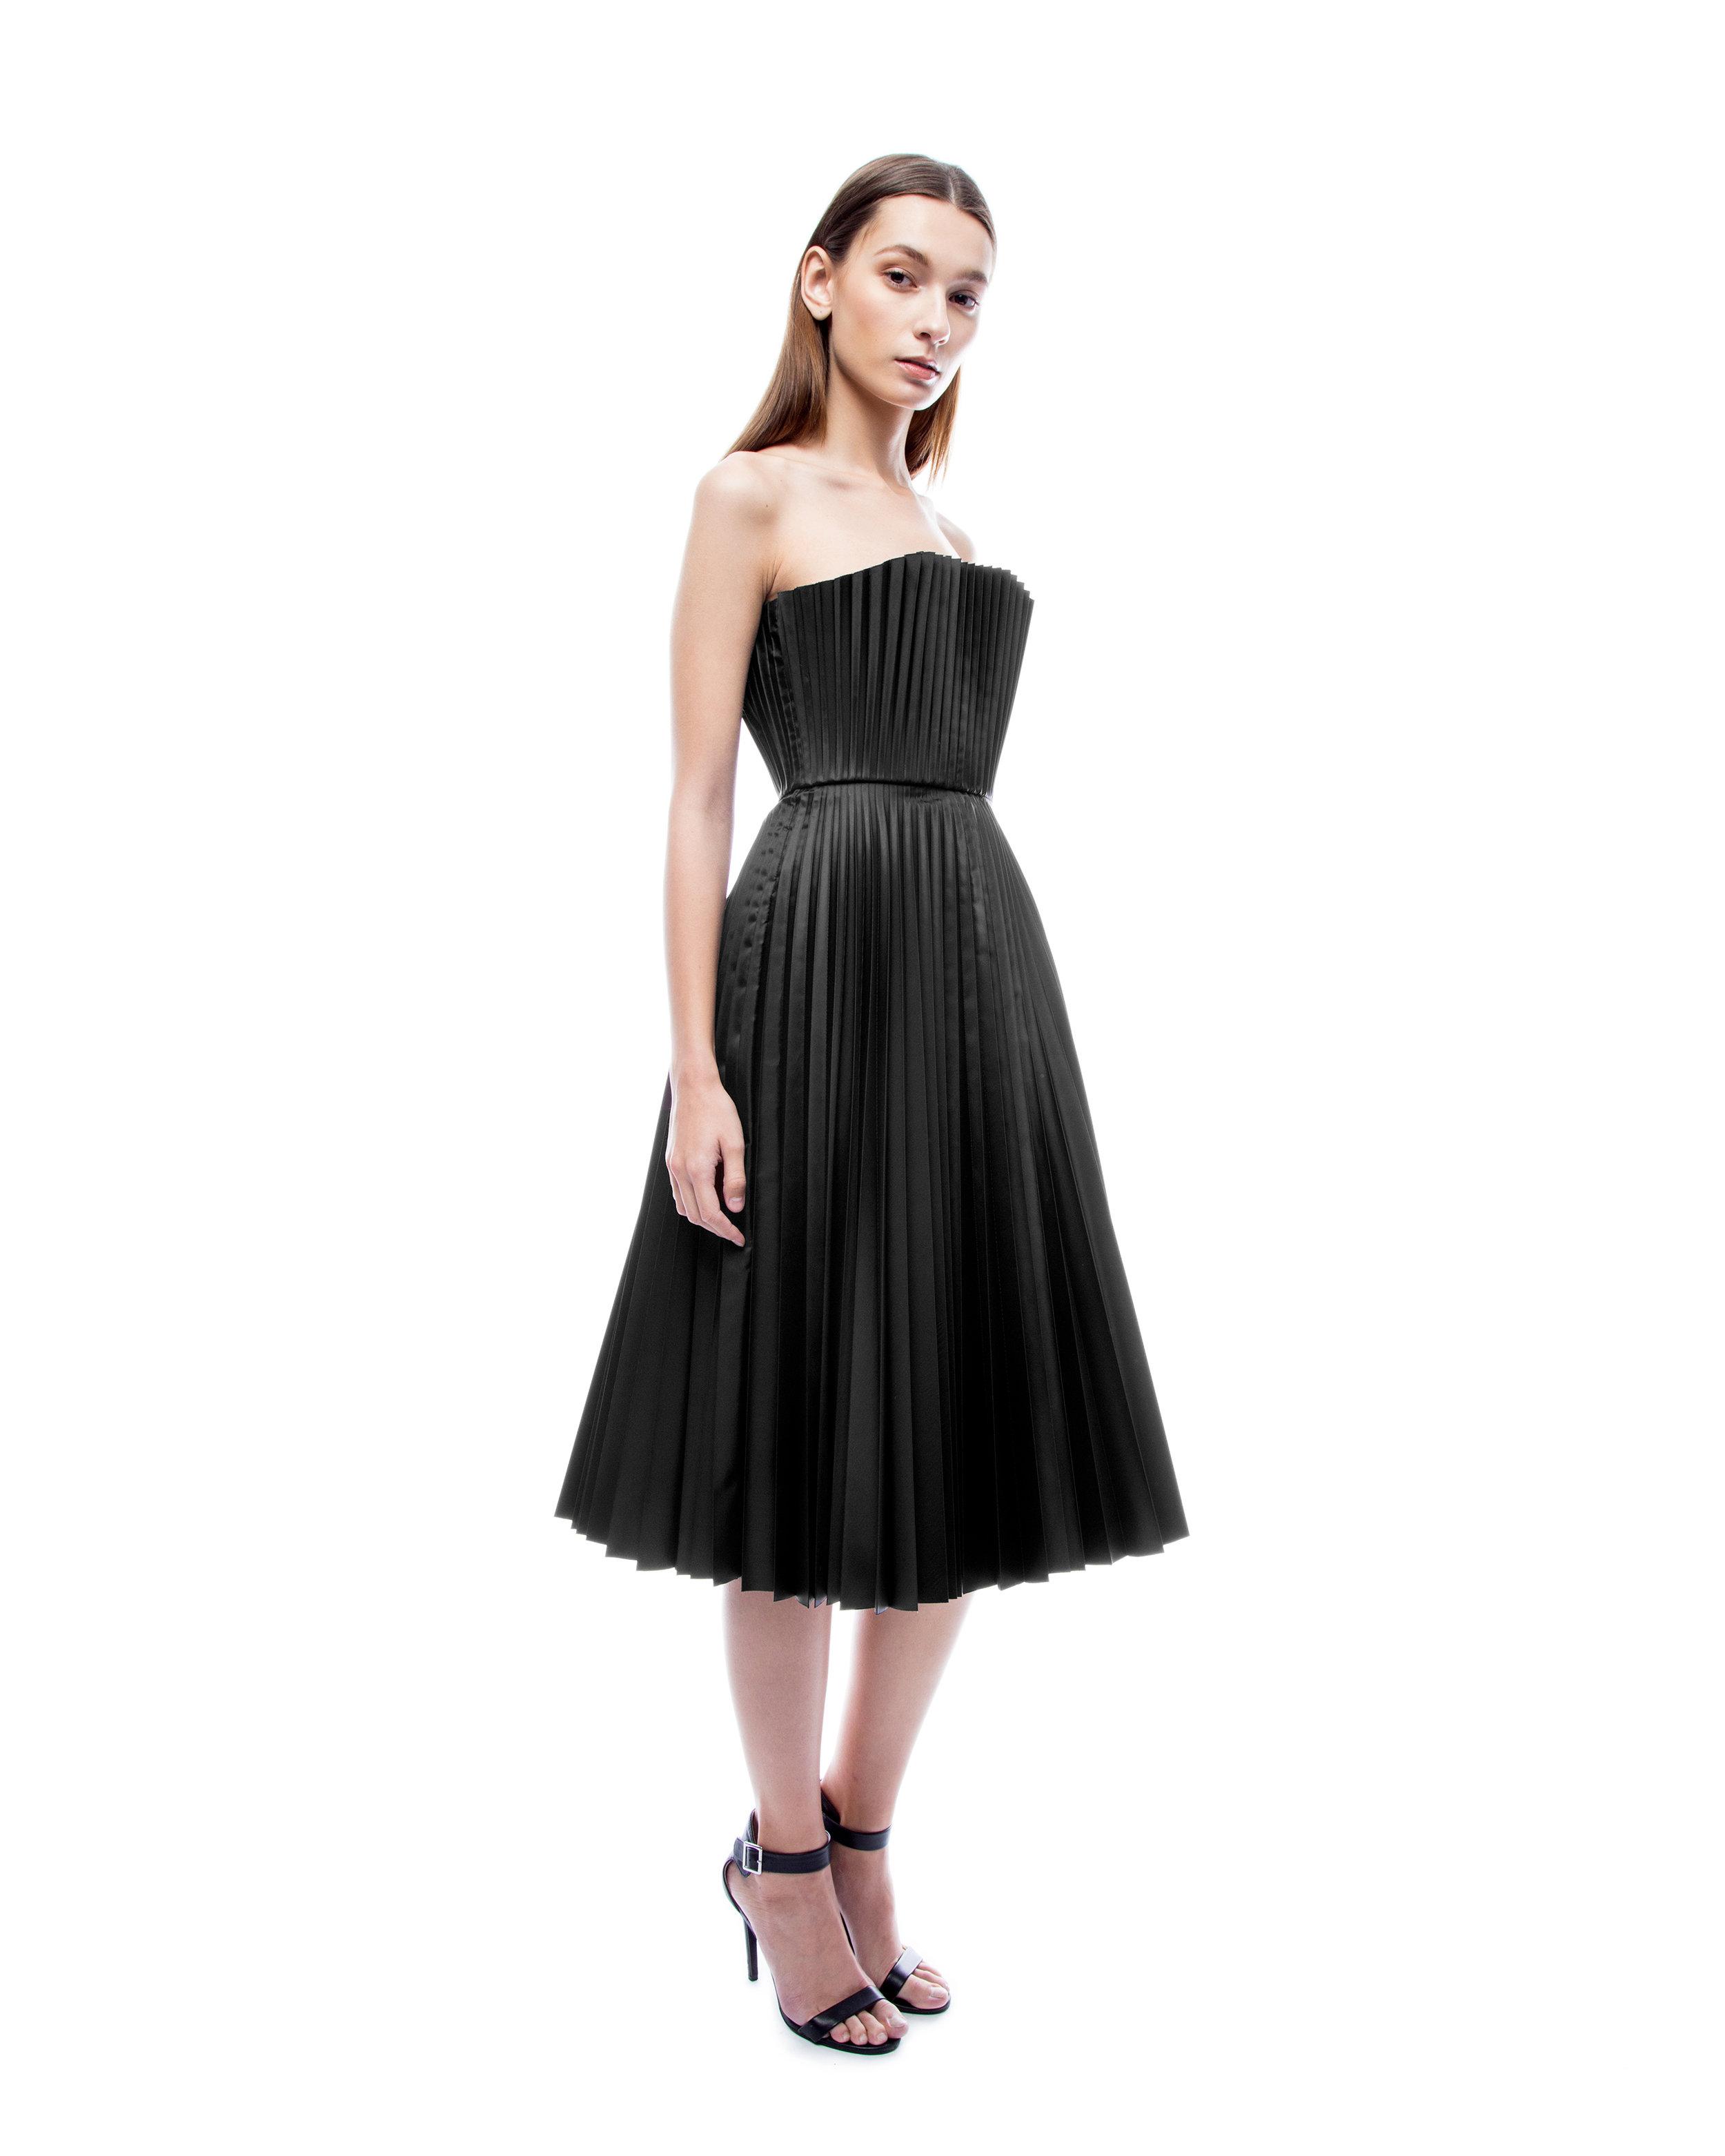 02-olya-kosterina-black-pleated-dress.jpg